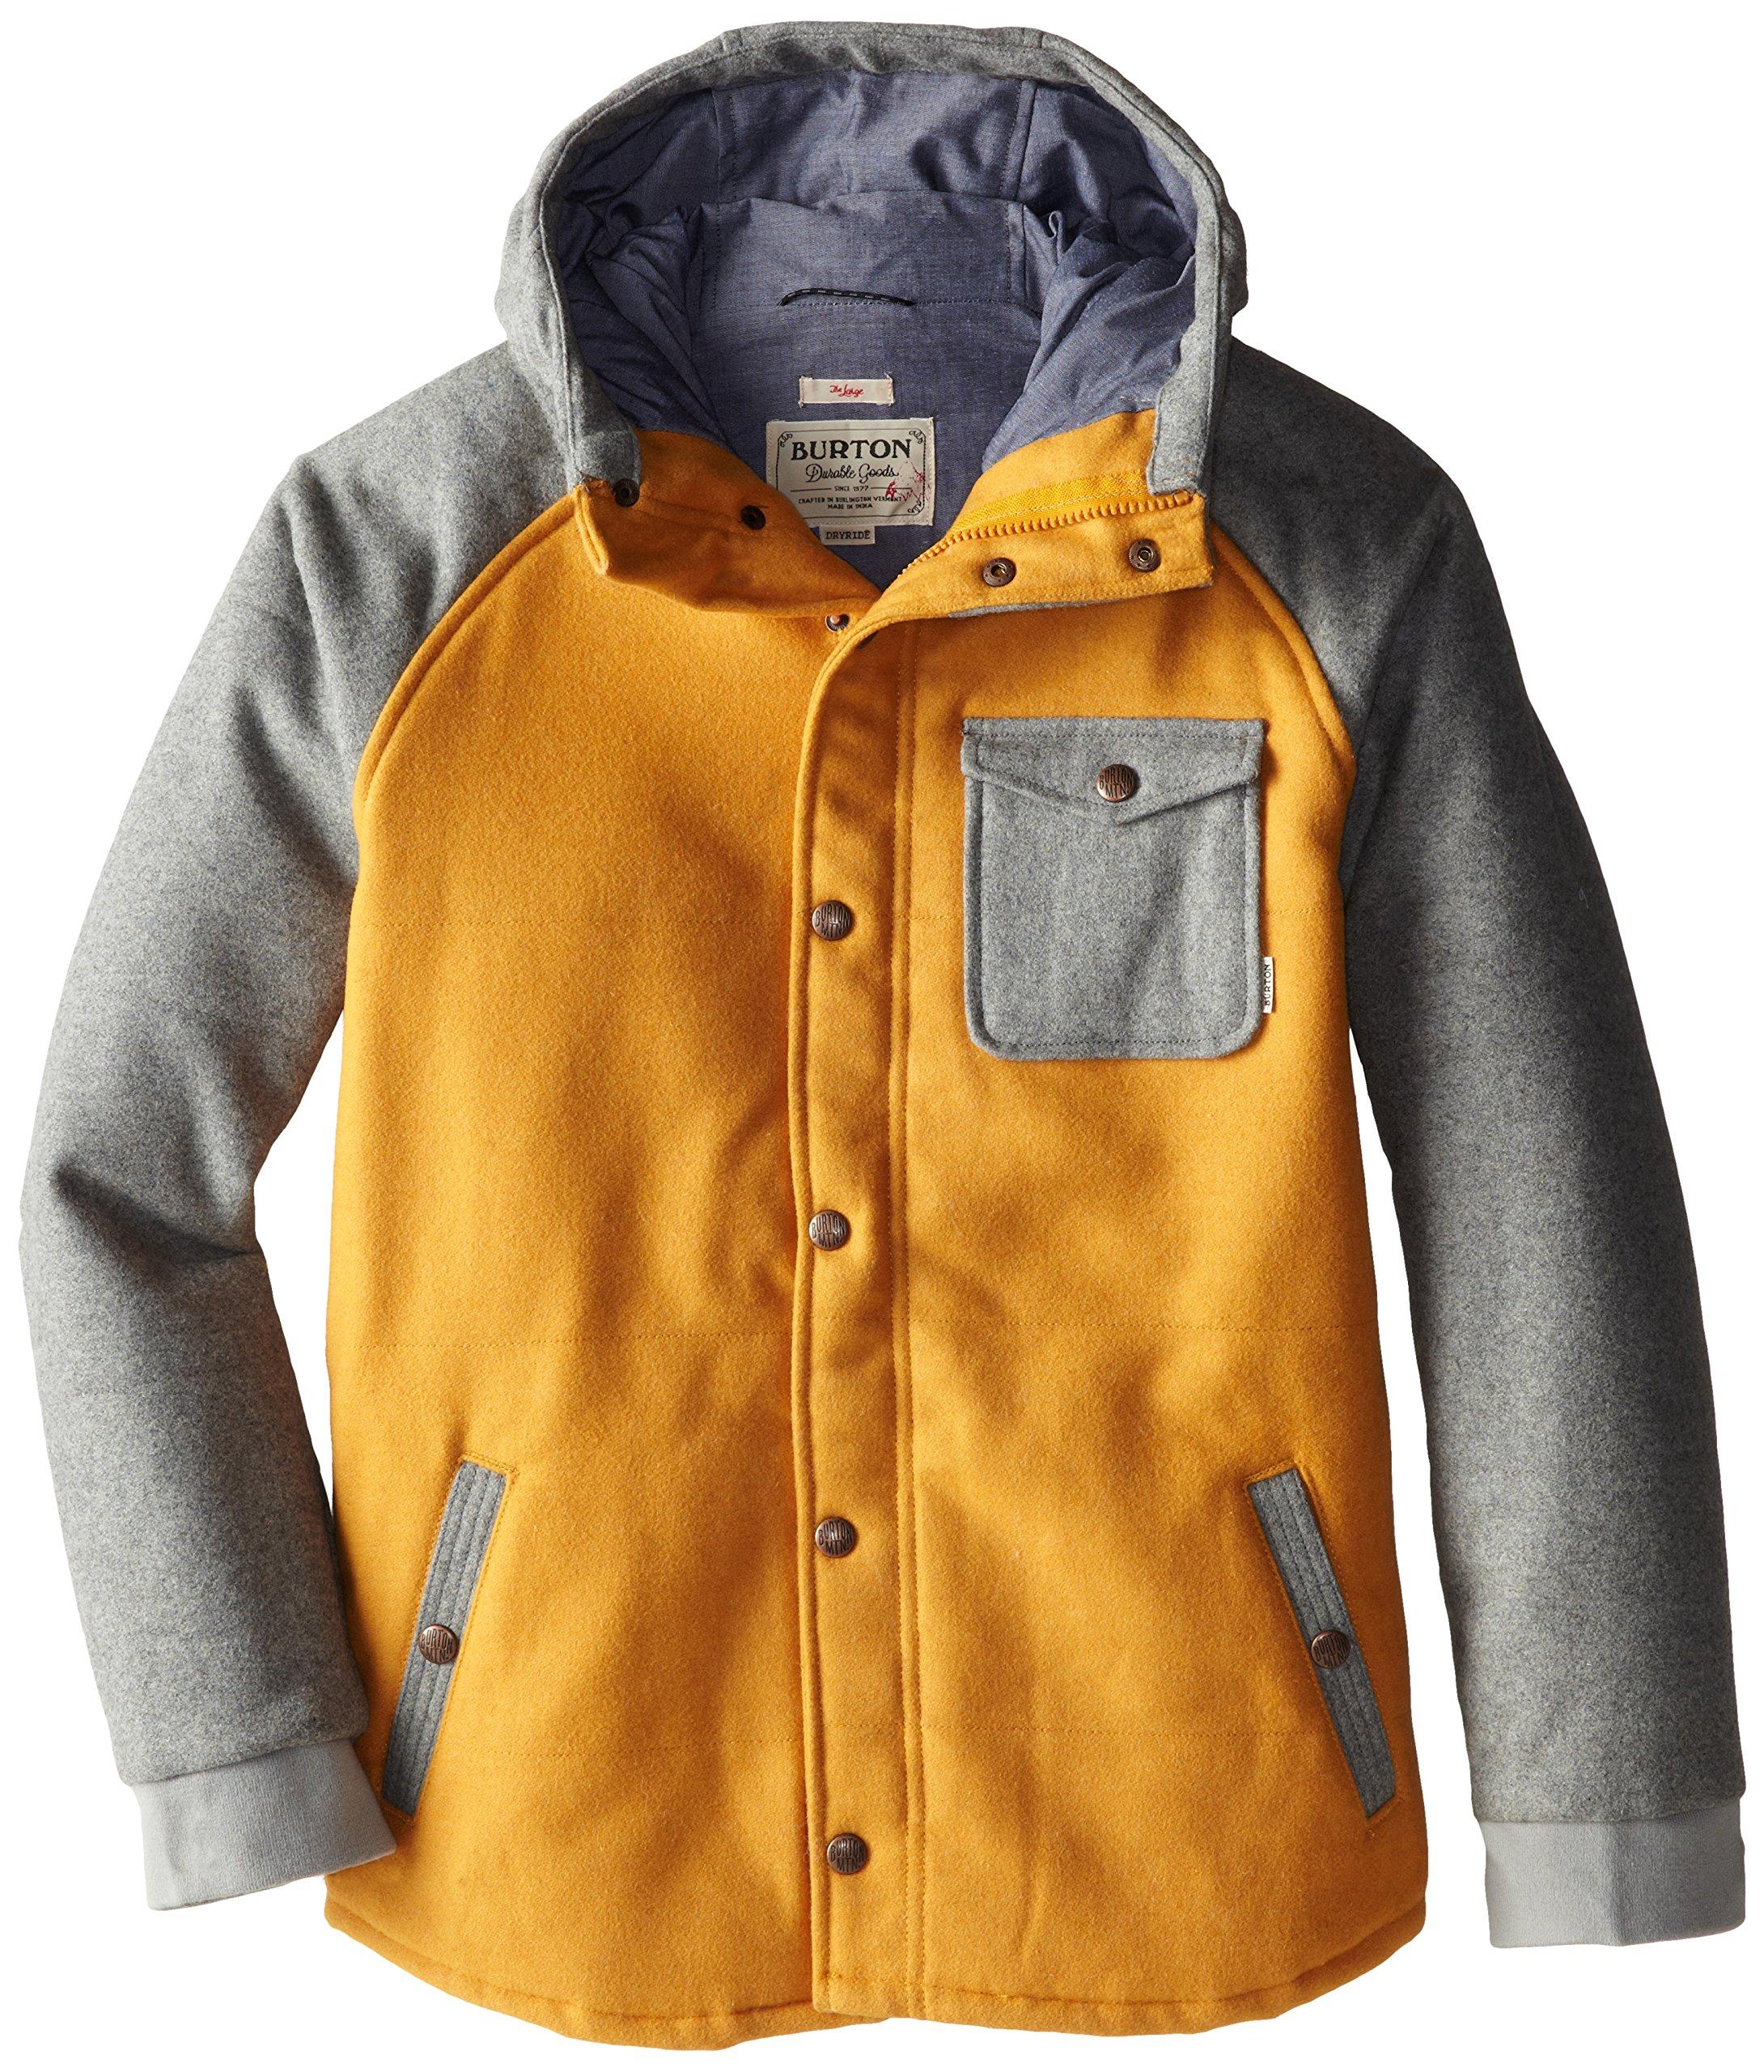 BURTON Boys Vibe Jacket, Inca, Large